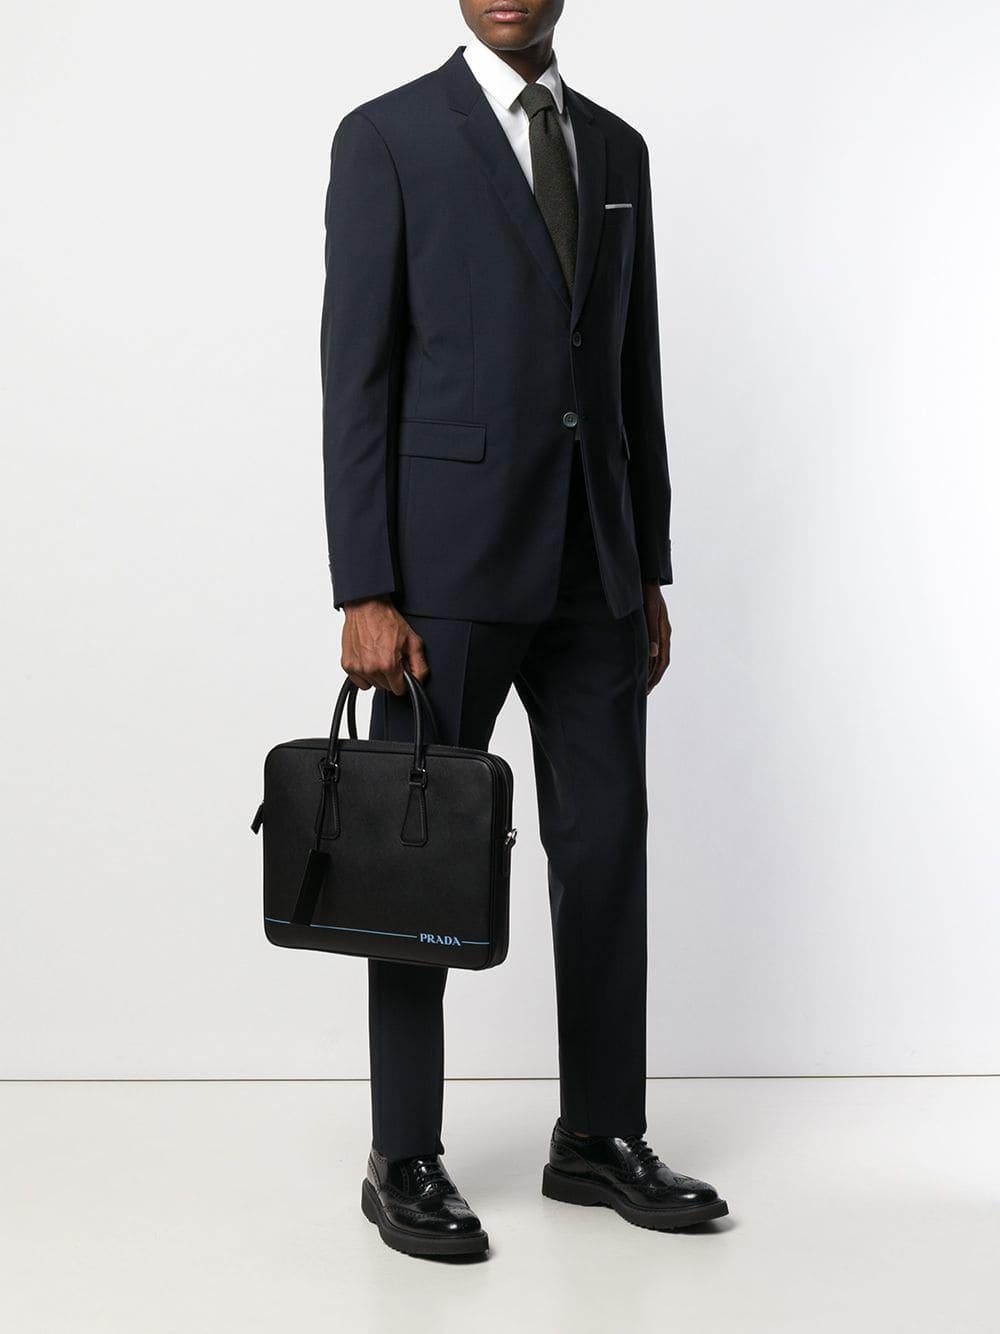 Prada - Black Contrast Logo Laptop Bag for Men - Lyst. View fullscreen c5a408de7f